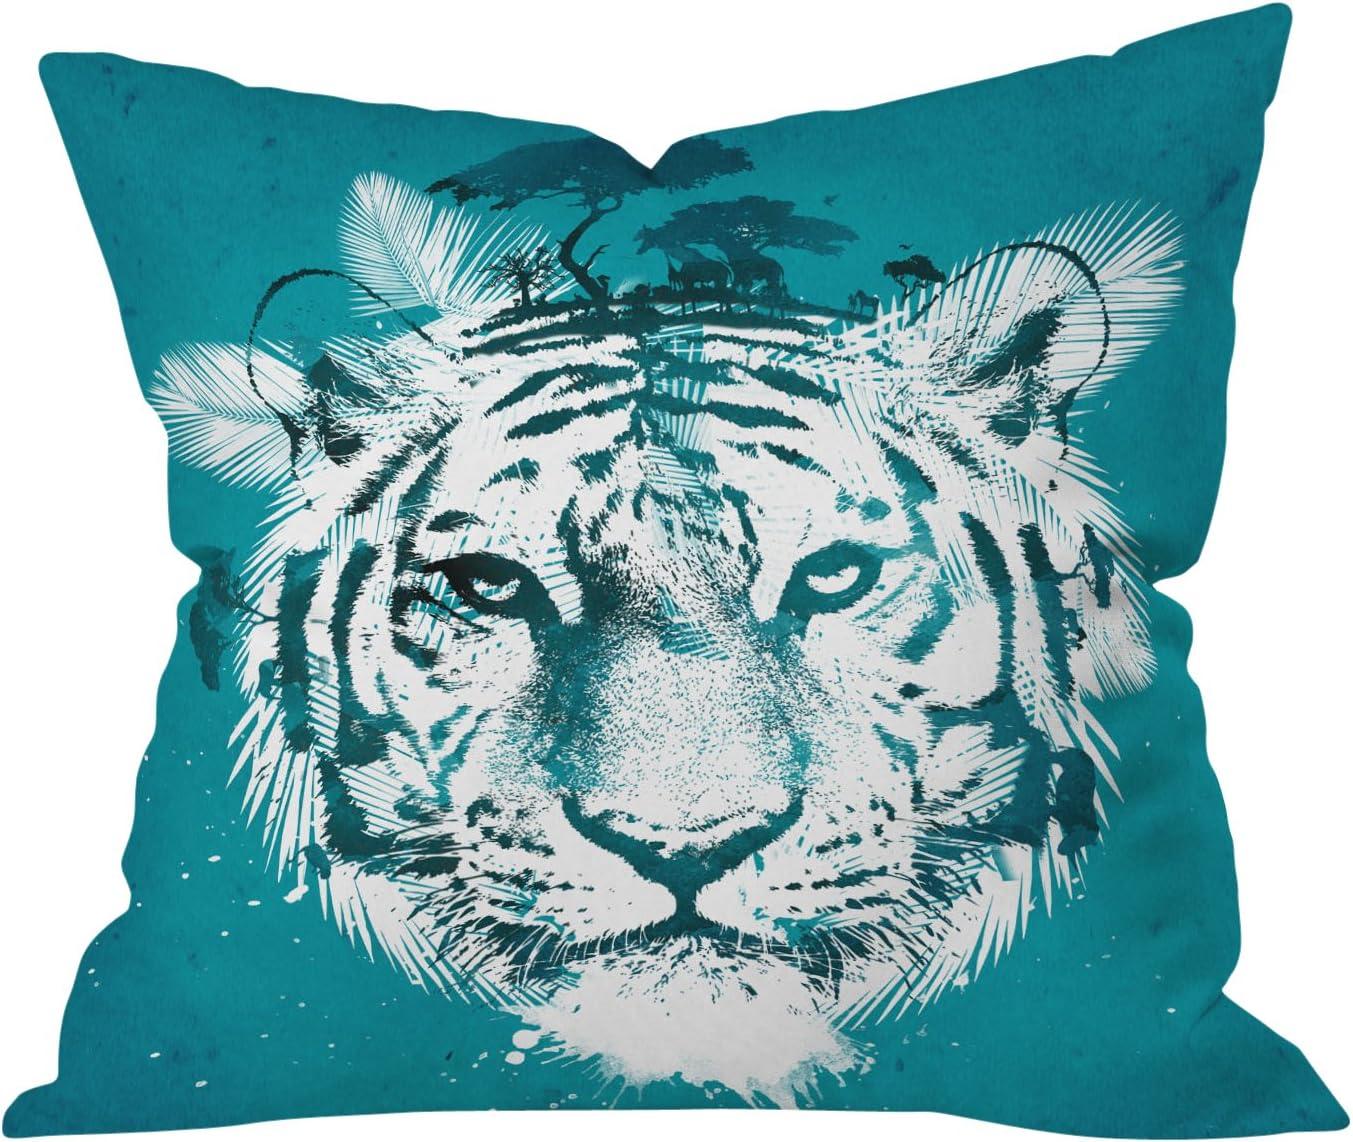 Deny Designs Robert Farkas White Tiger Throw Pillow, 26 x 26